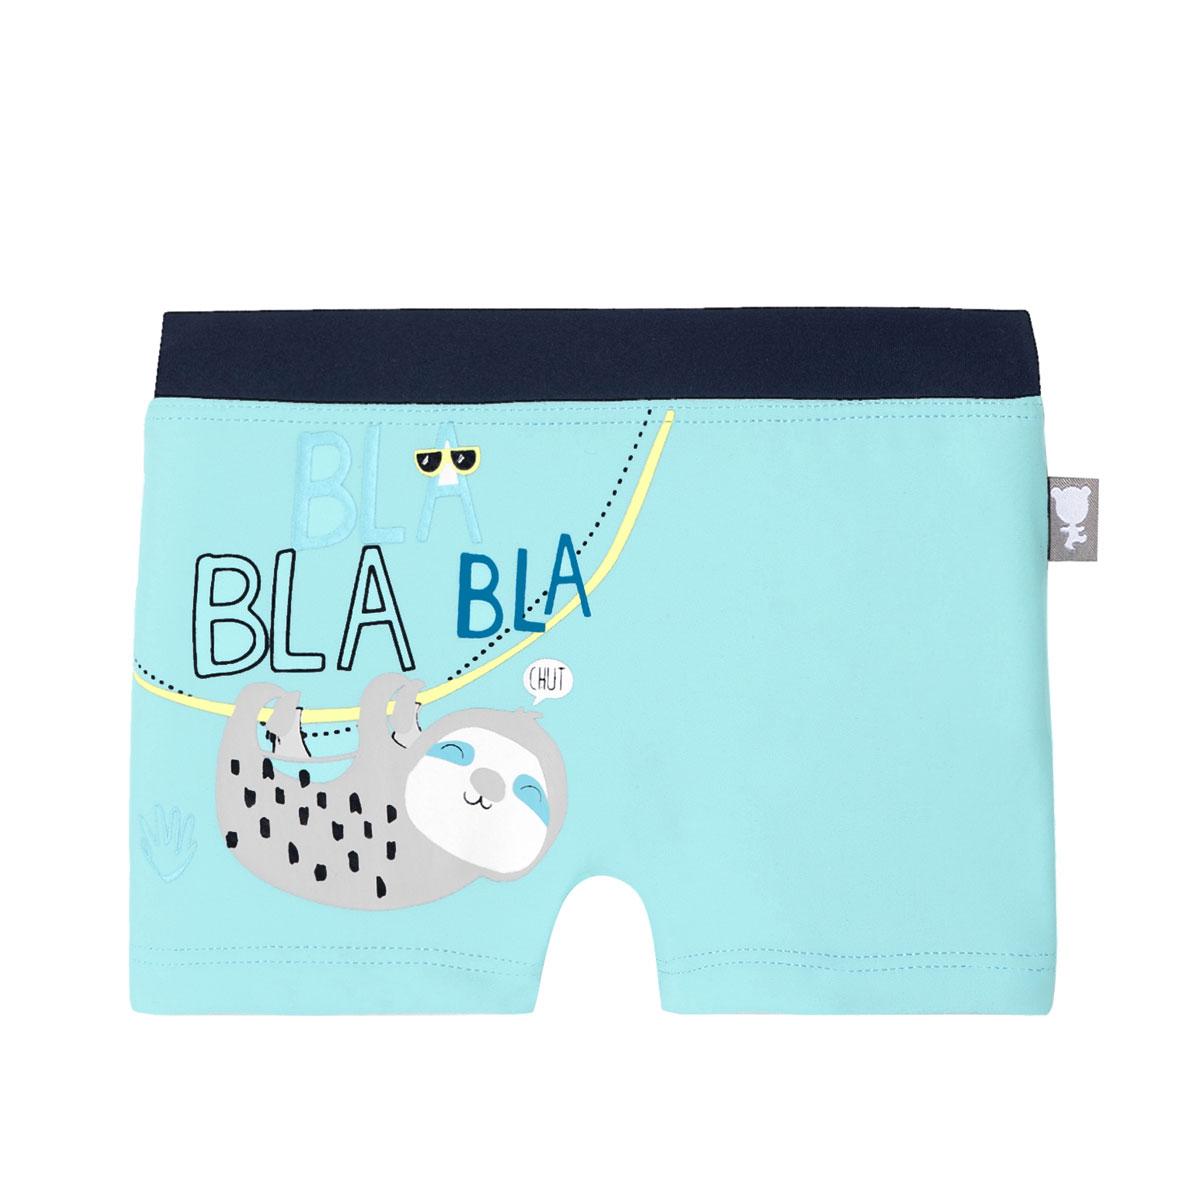 Maillot de bain bébé garçon ANTI-UV 2 pièces t-shirt & boxer Pampa bas